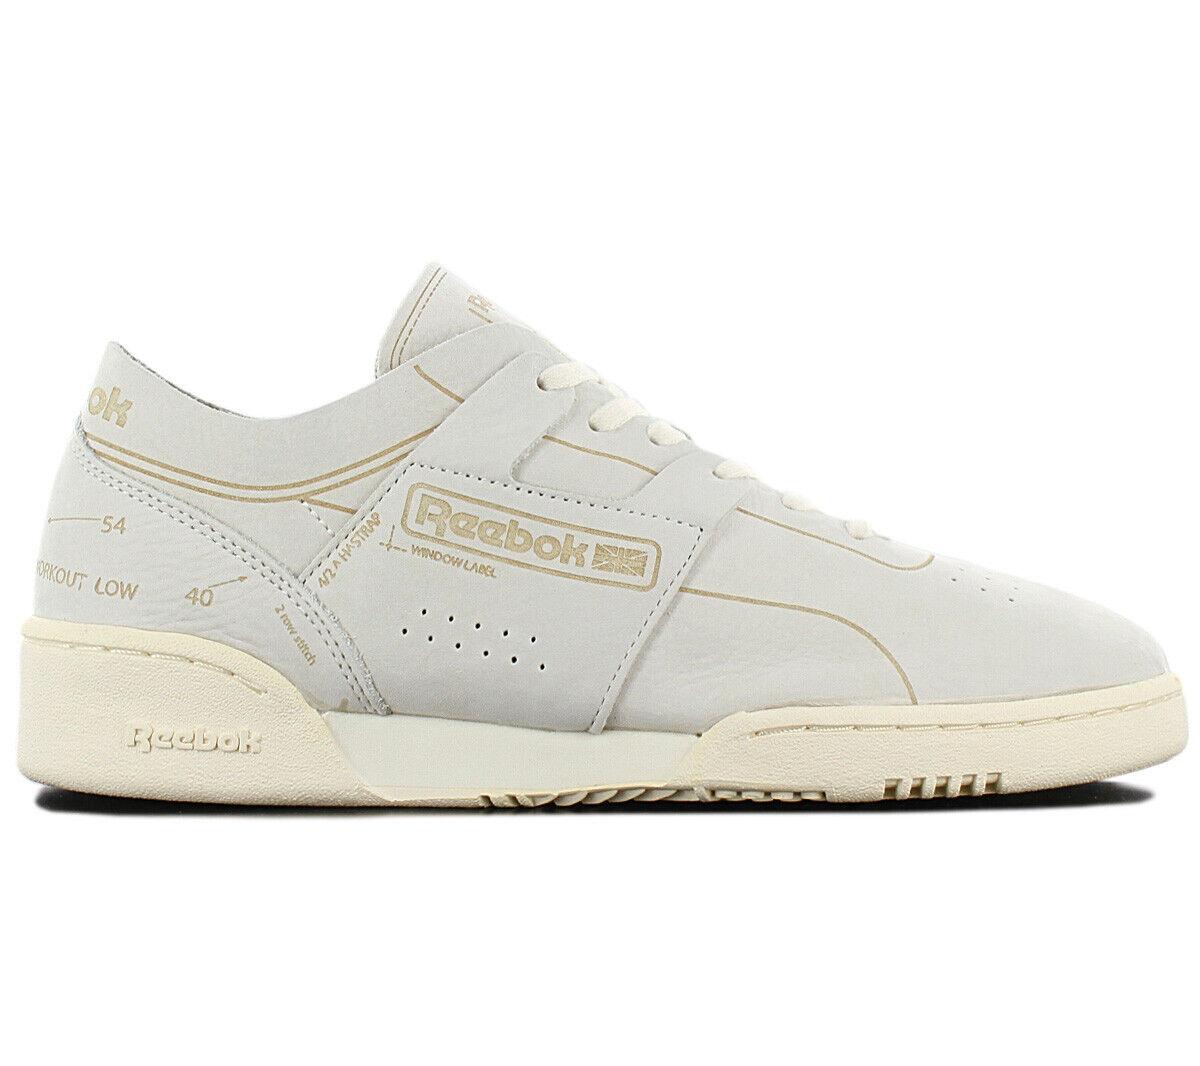 Reebok treadmill Low Clean HMG scarpe da ginnastica Premium Scarpe Scarpe Scarpe Pelle bd1966 Nuovo Scarpe Da Ginnastica 453f17